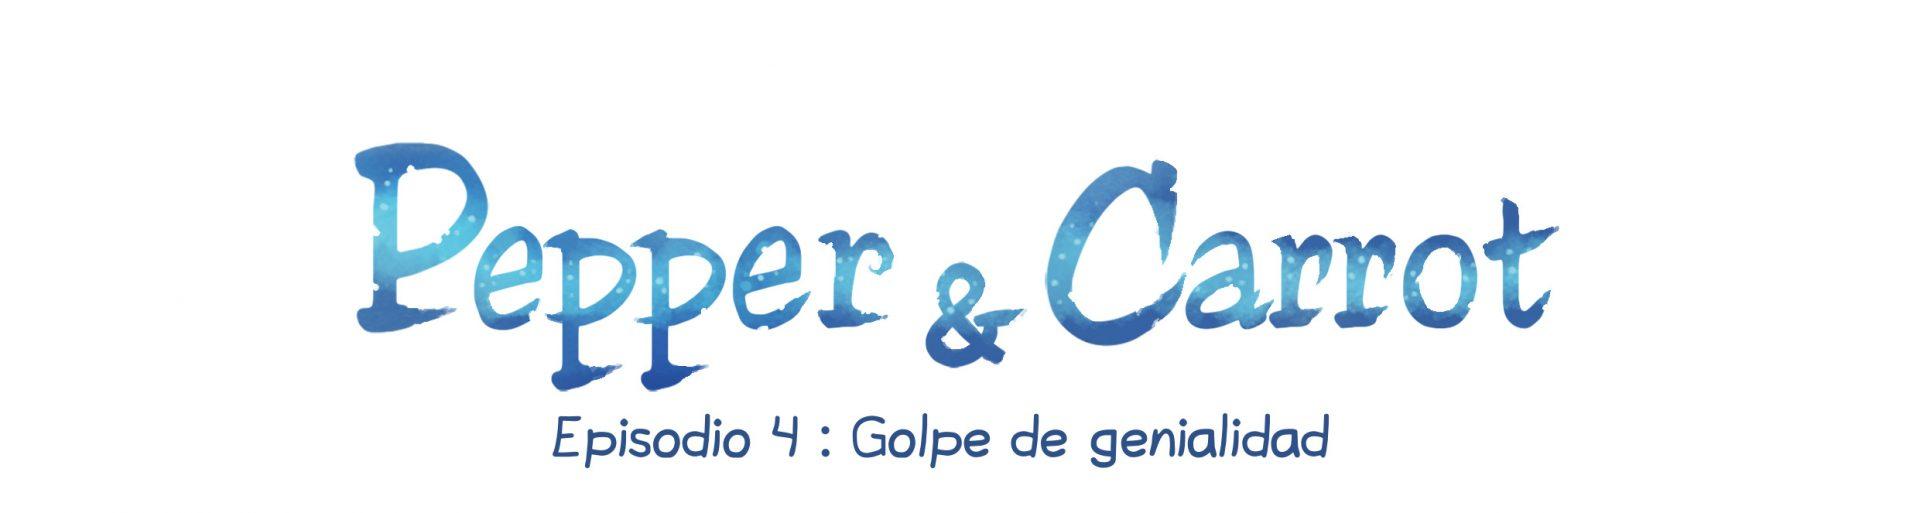 Pepper_Carrot_esp_04_00